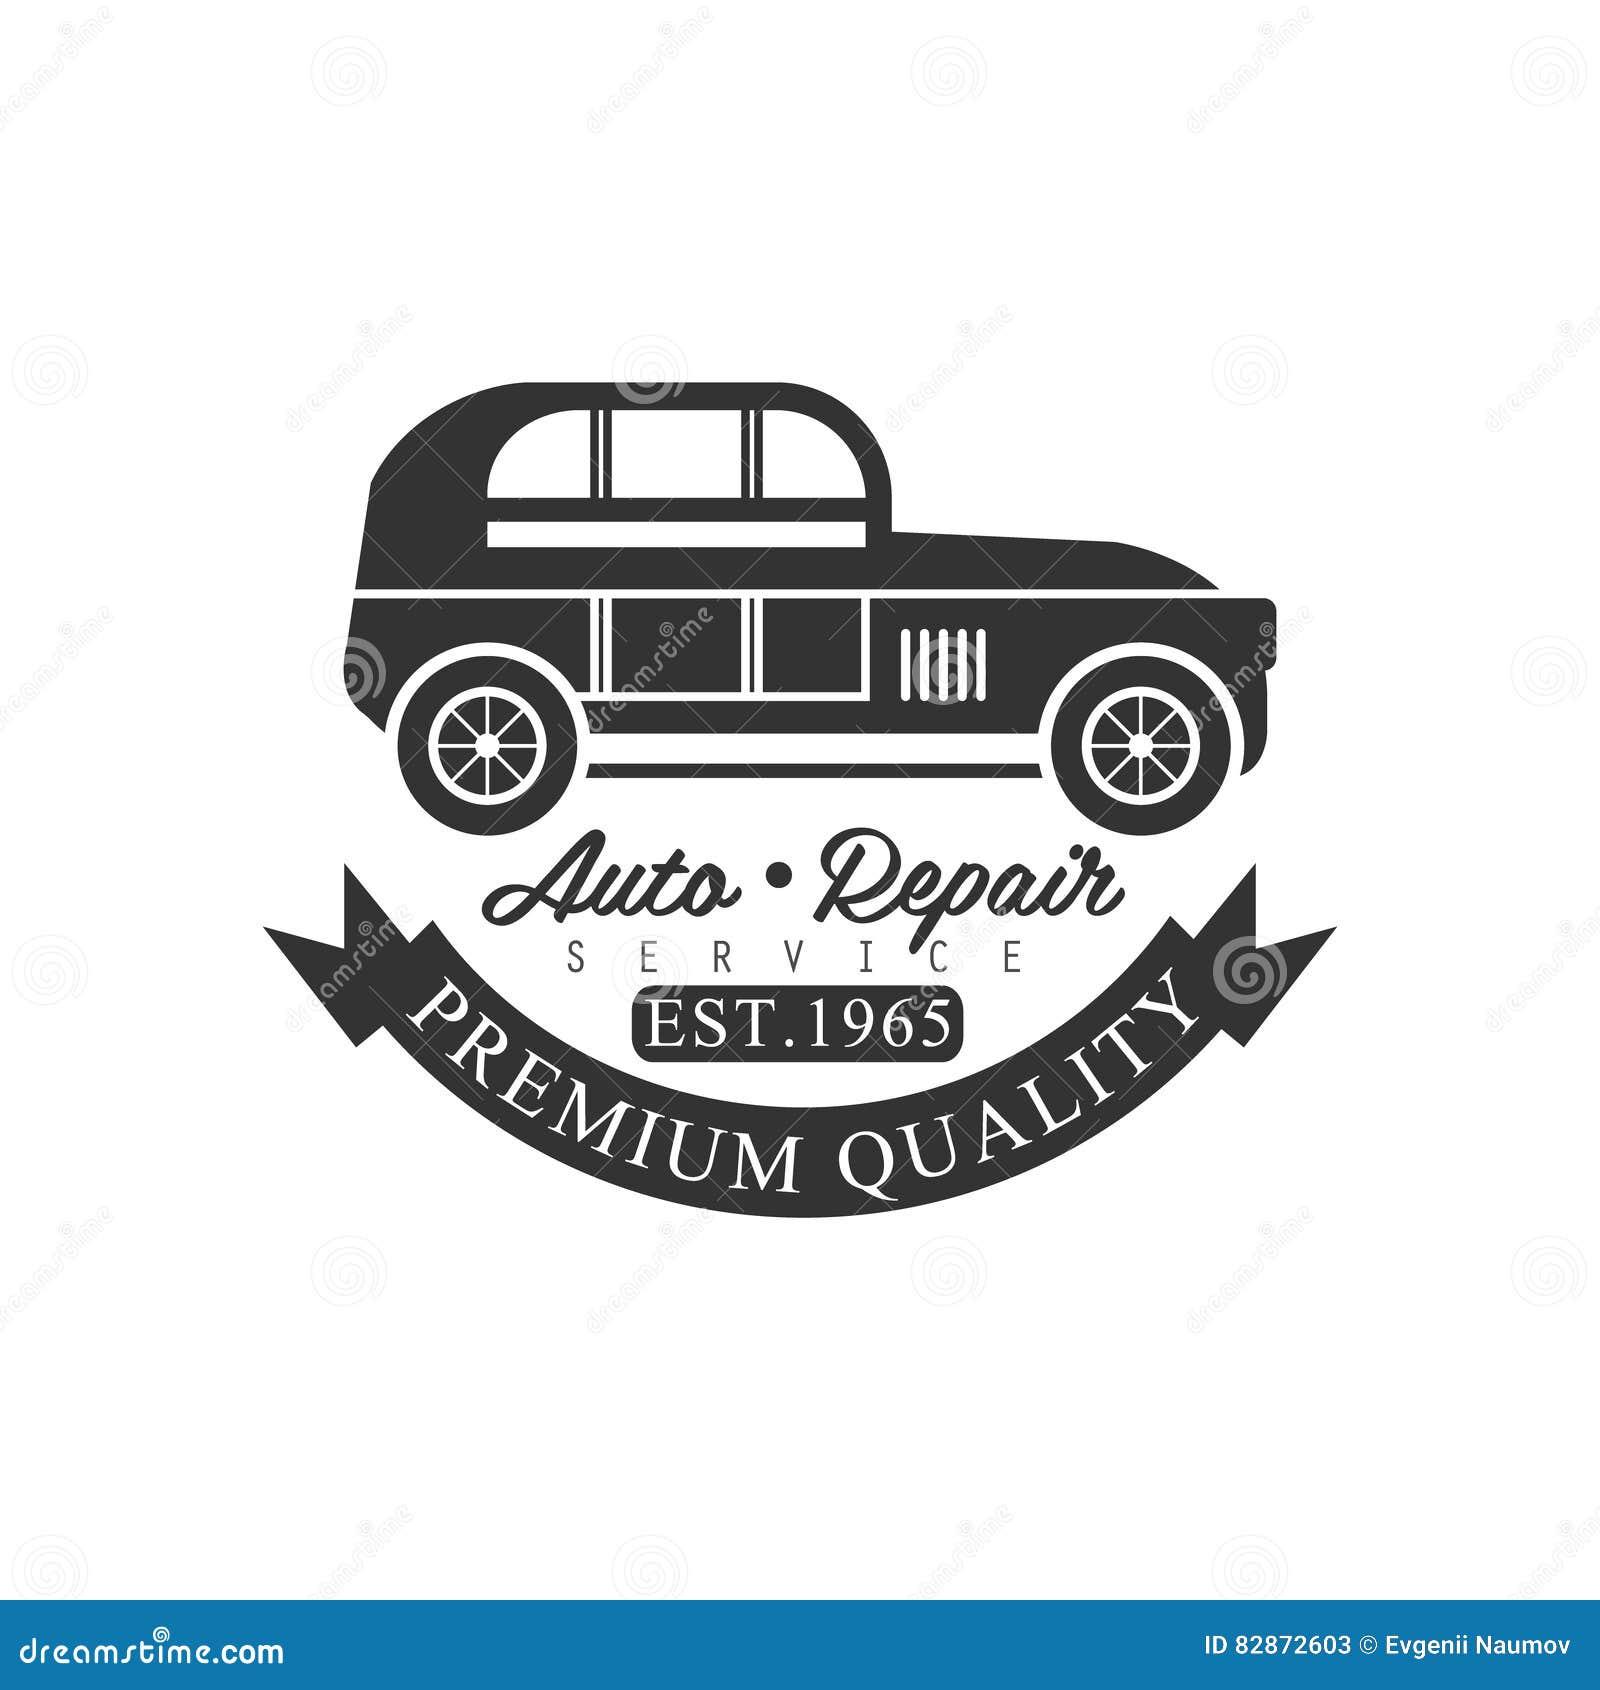 Design car repair workshop - Premium Quality Car Repair Workshop Black And White Label Design Template